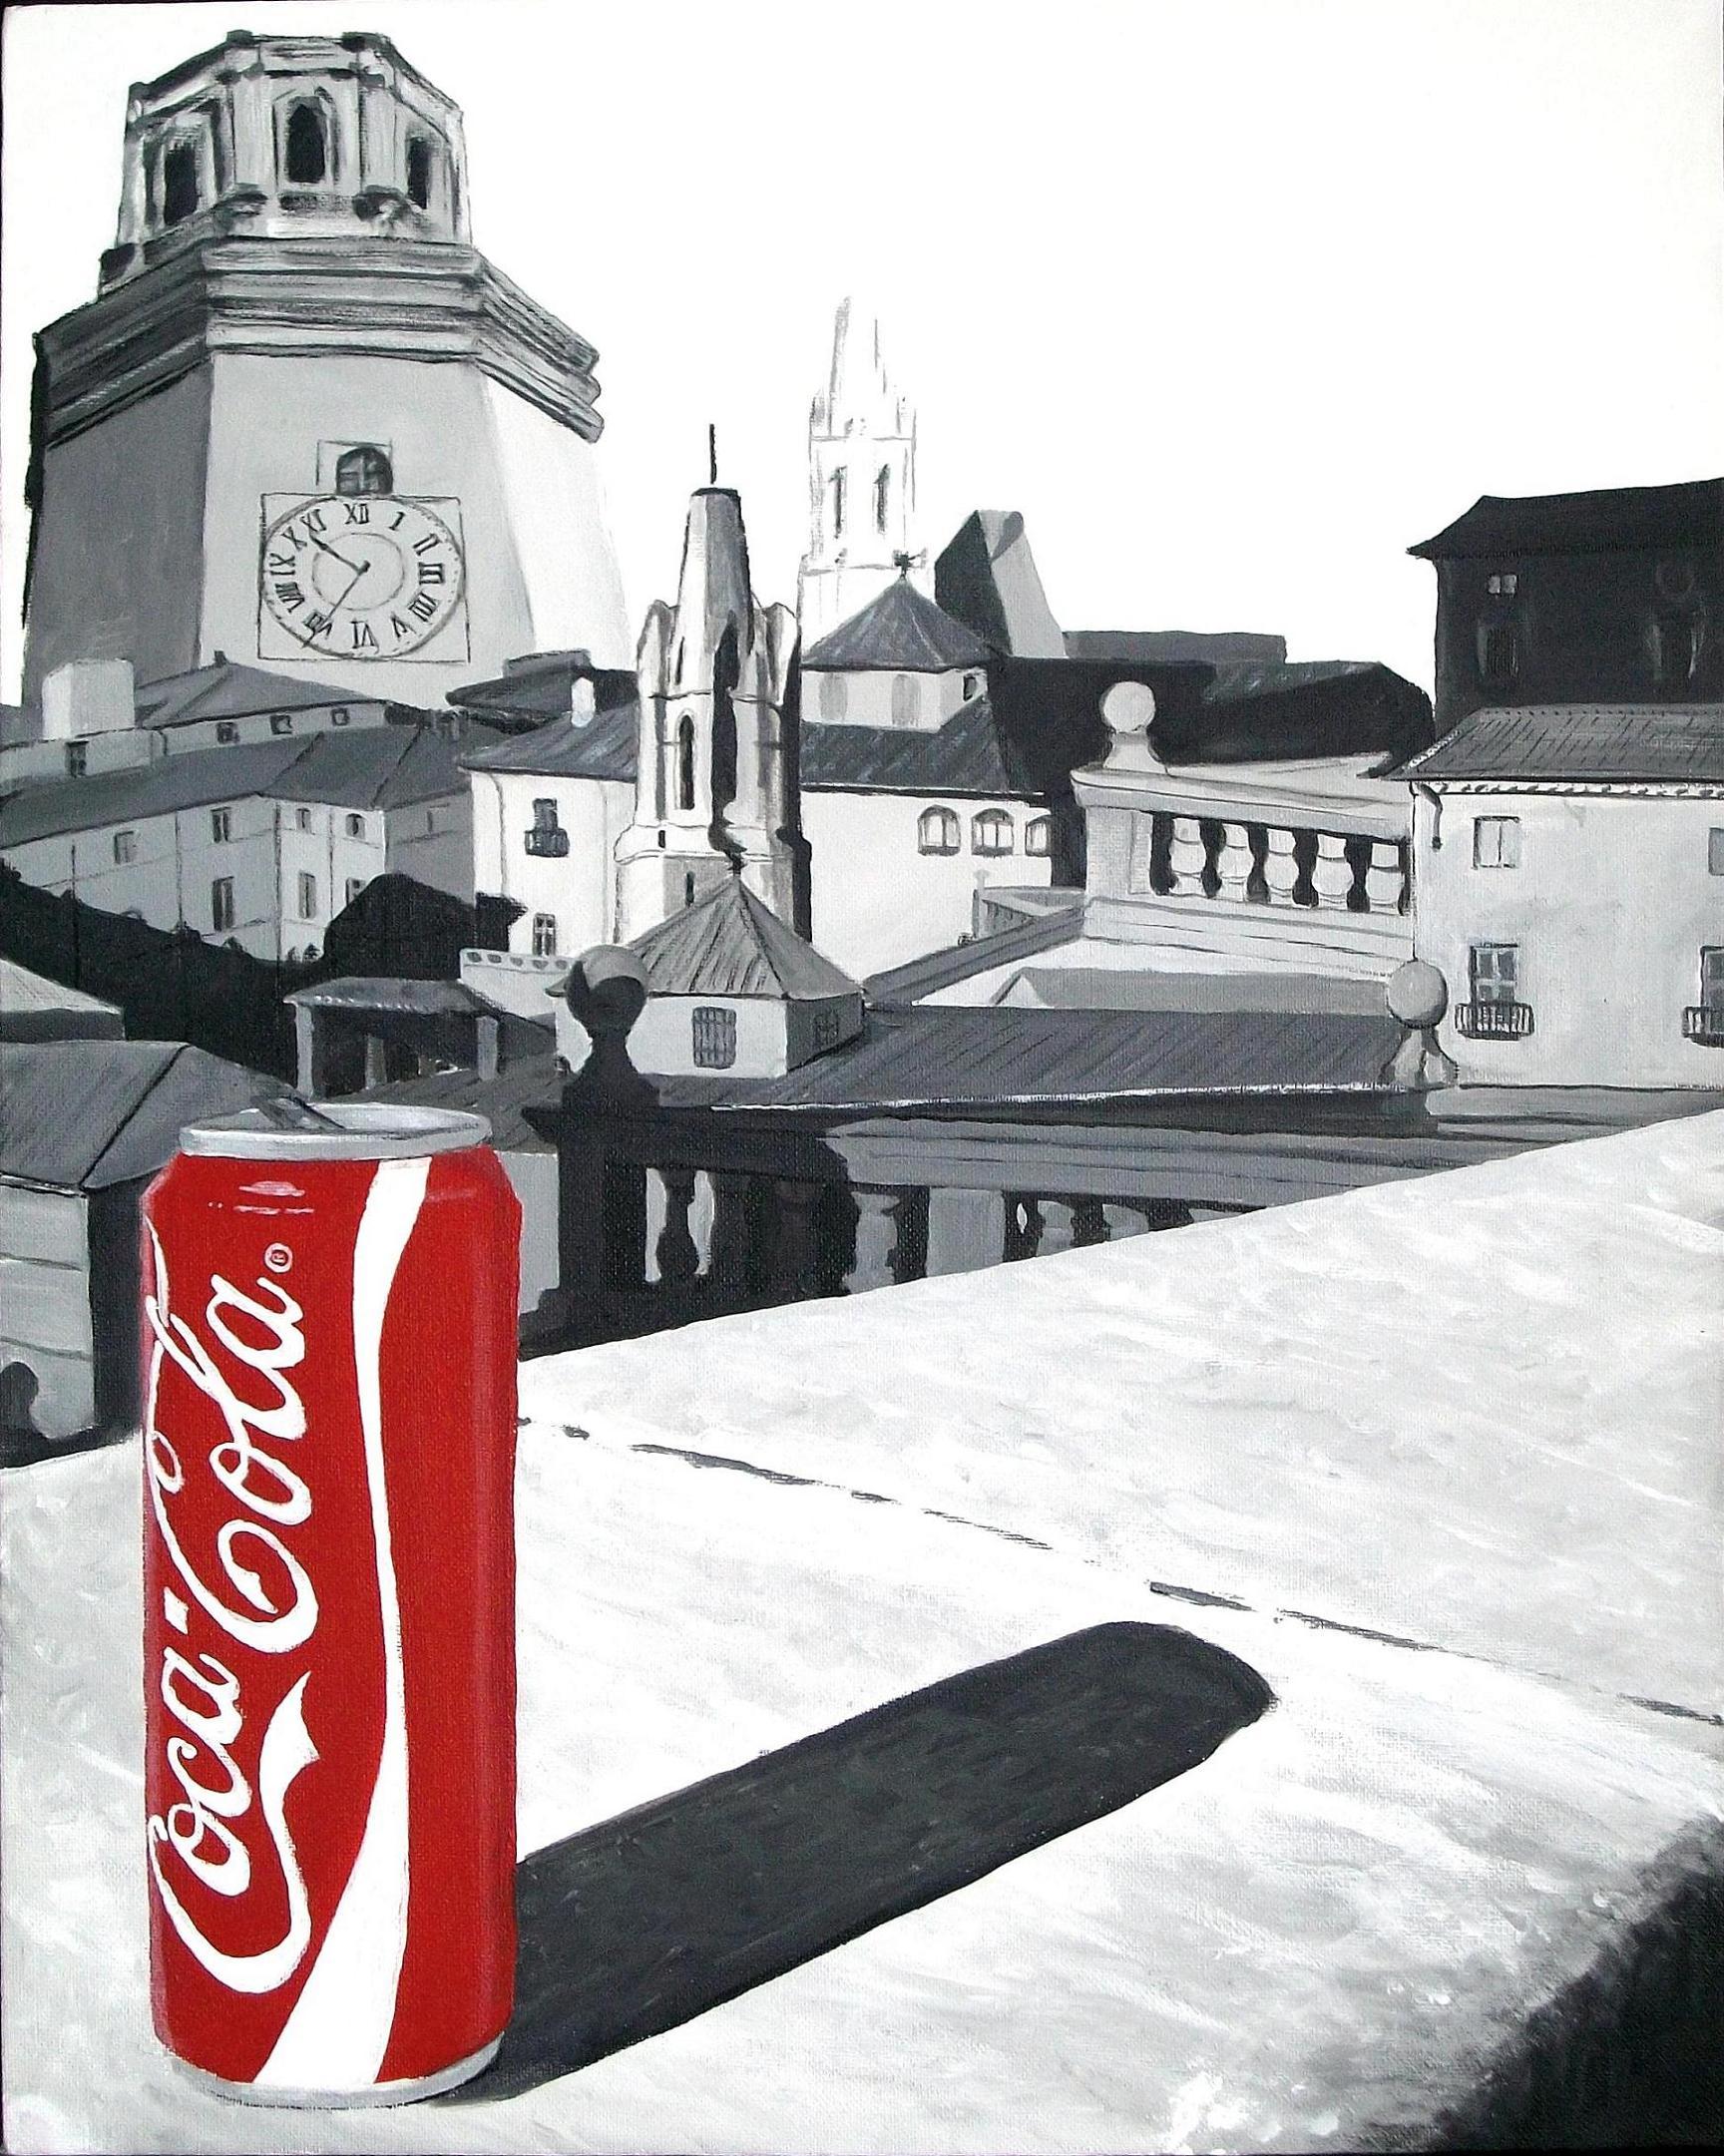 Coke can in Girona, Spain